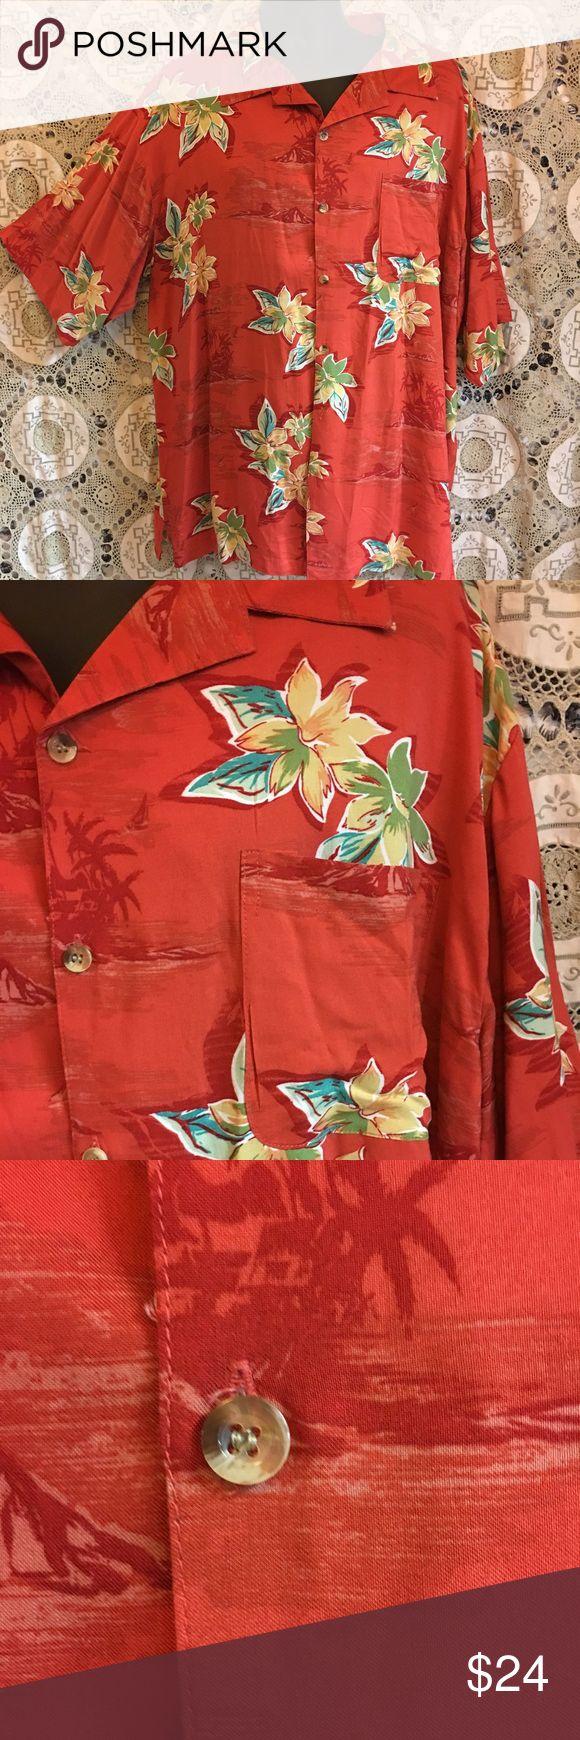 Mens Hawaiian shirt with Abalone shell buttons XXL XXL men's Hawaiian shirt bright red with floral print island blue Shirts Casual Button Down Shirts